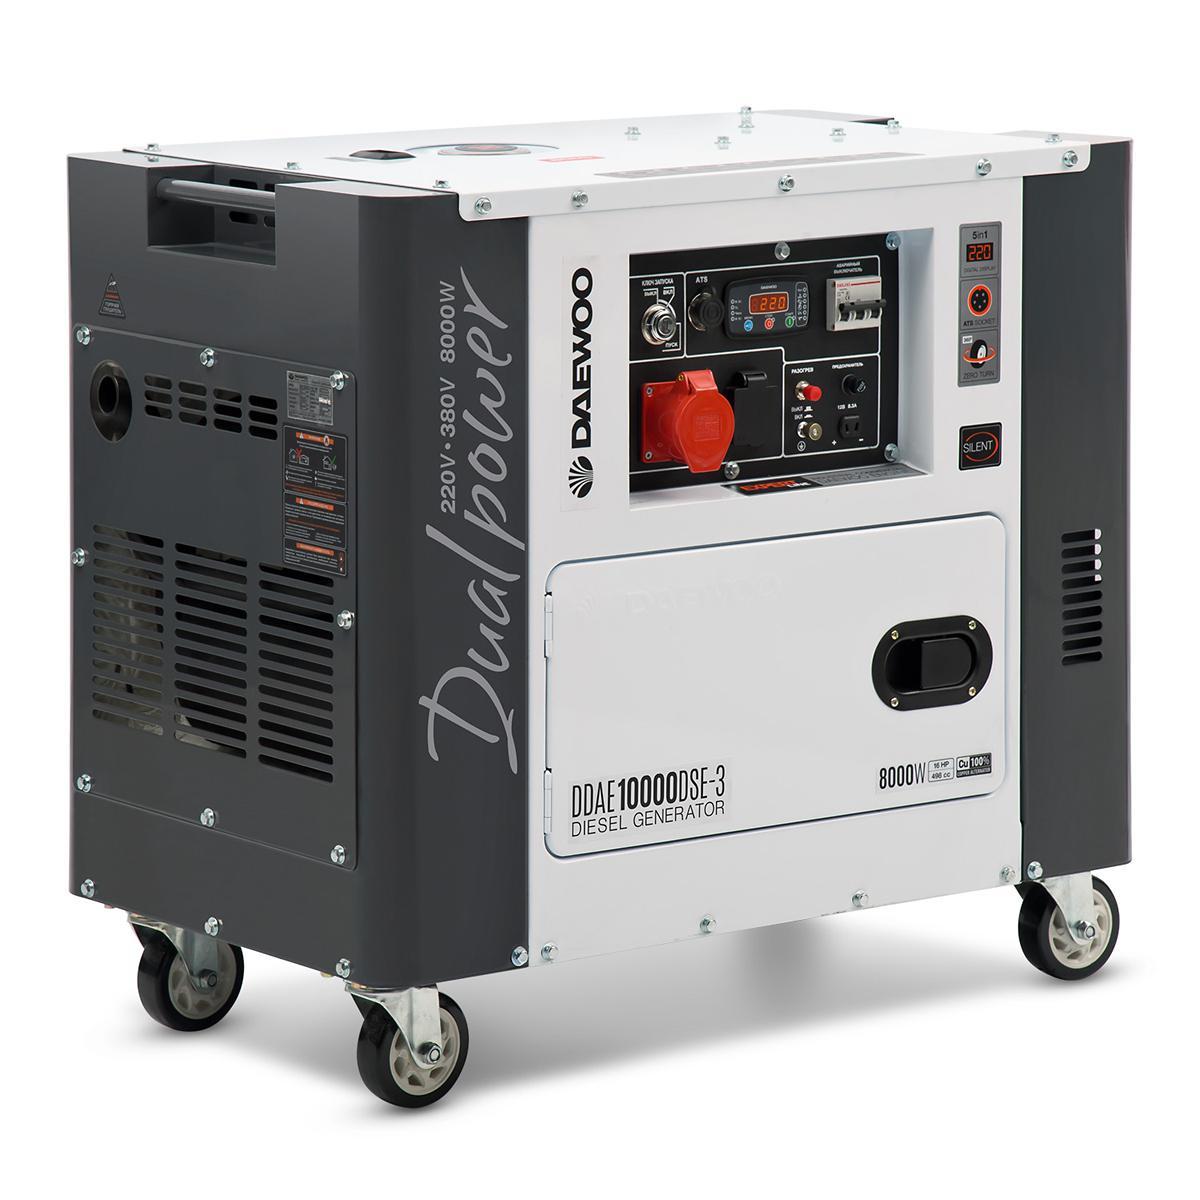 Дизельный генератор Daewoo Ddae10000dse-3